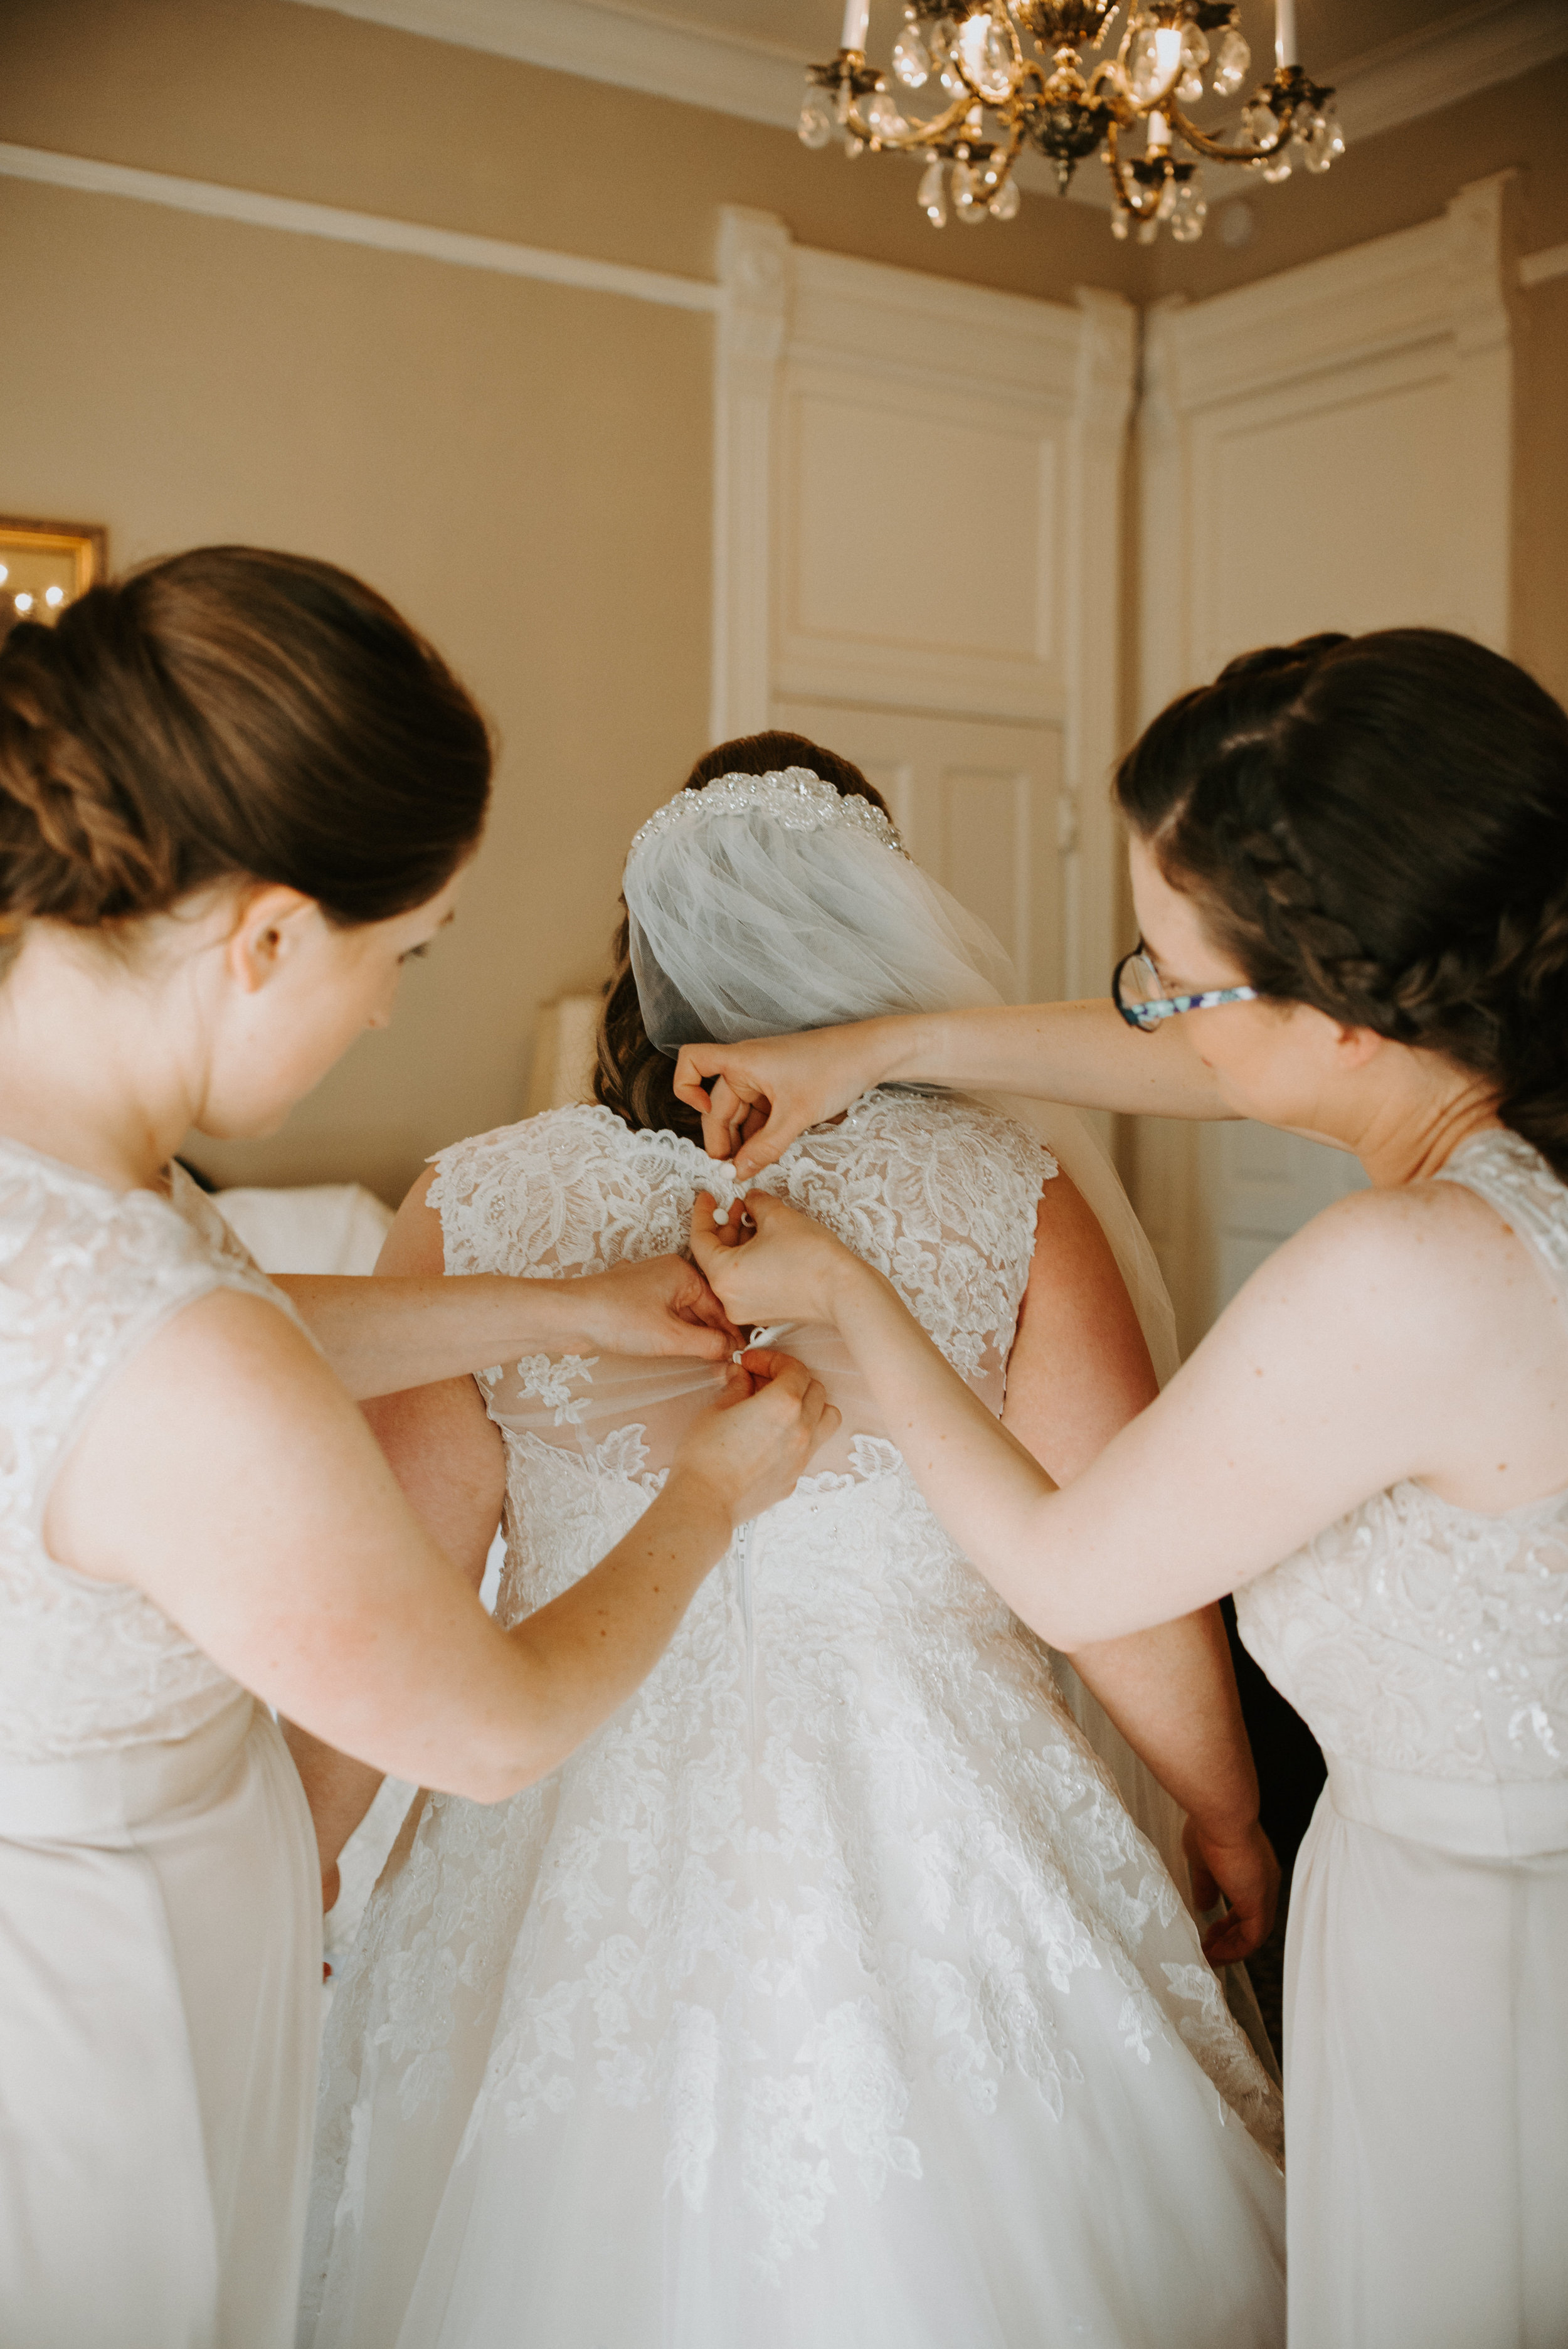 WonderlyCreative_Wedding_5.12.18_Megan&Swapnil_-386a57a14.jpg